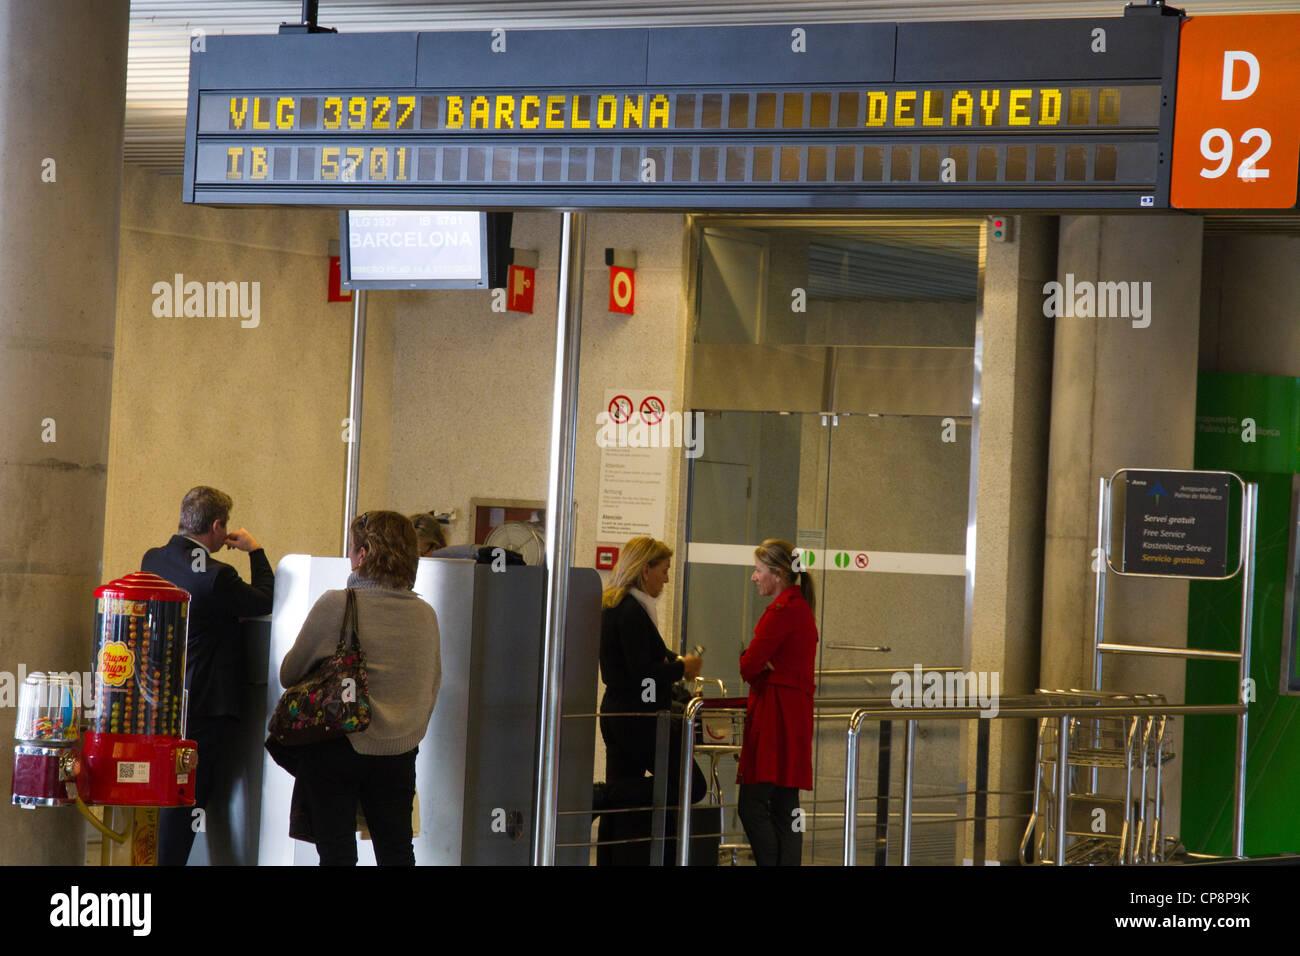 Aeroporto fly cartello ritardato indoor Palma de Maiorca Spagna Immagini Stock